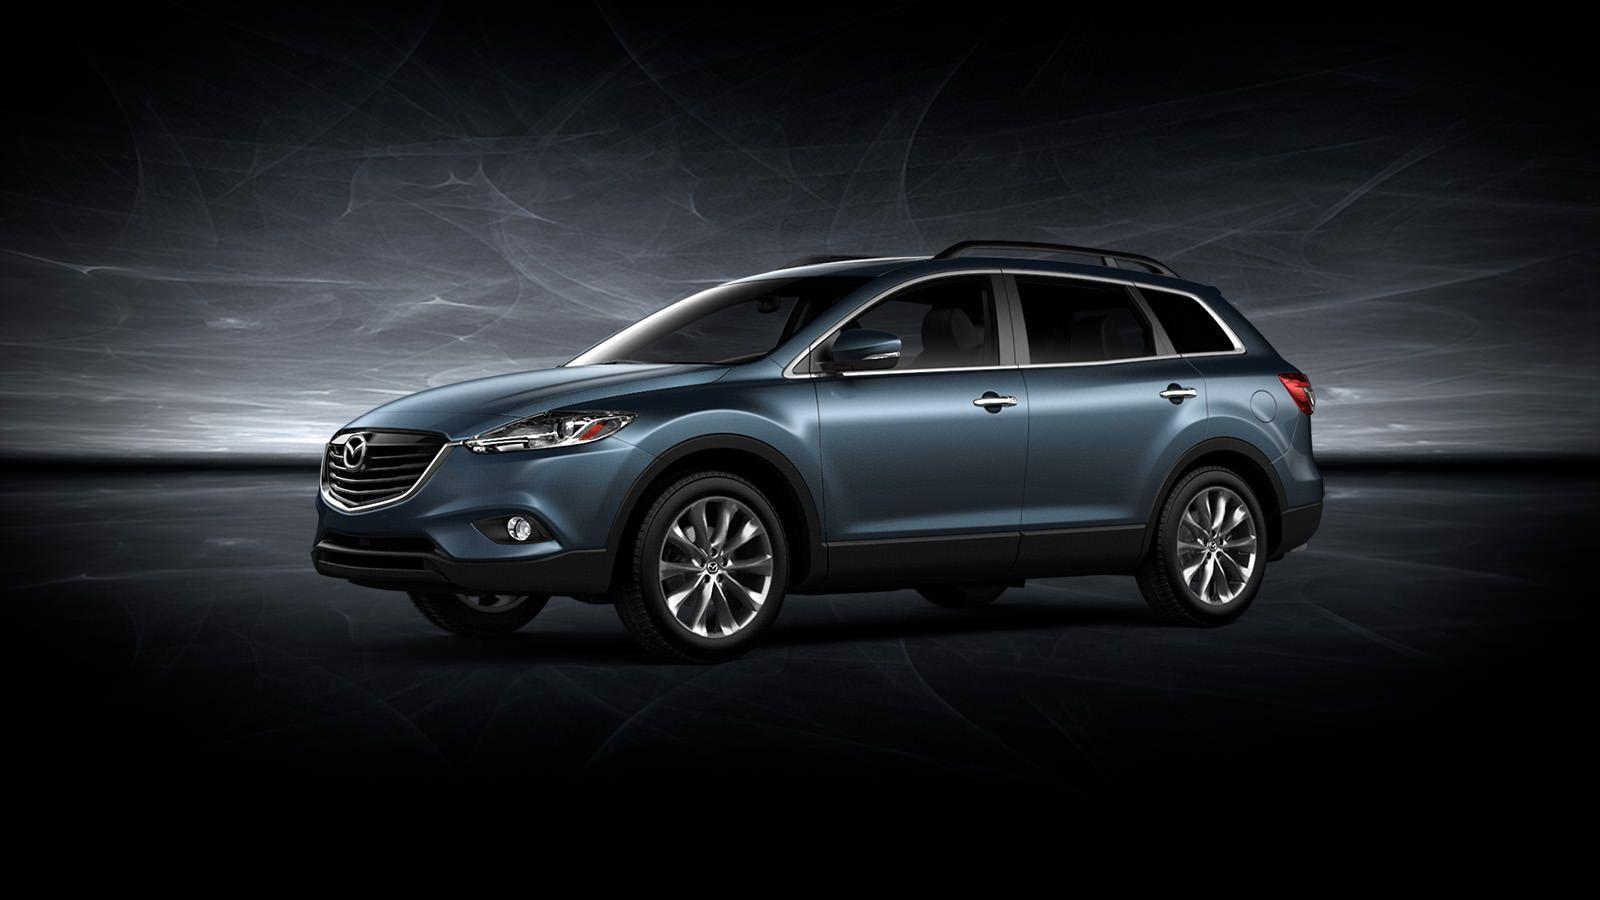 2014 Mazda CX9 7Passenger Crossover SUV Mazda USA